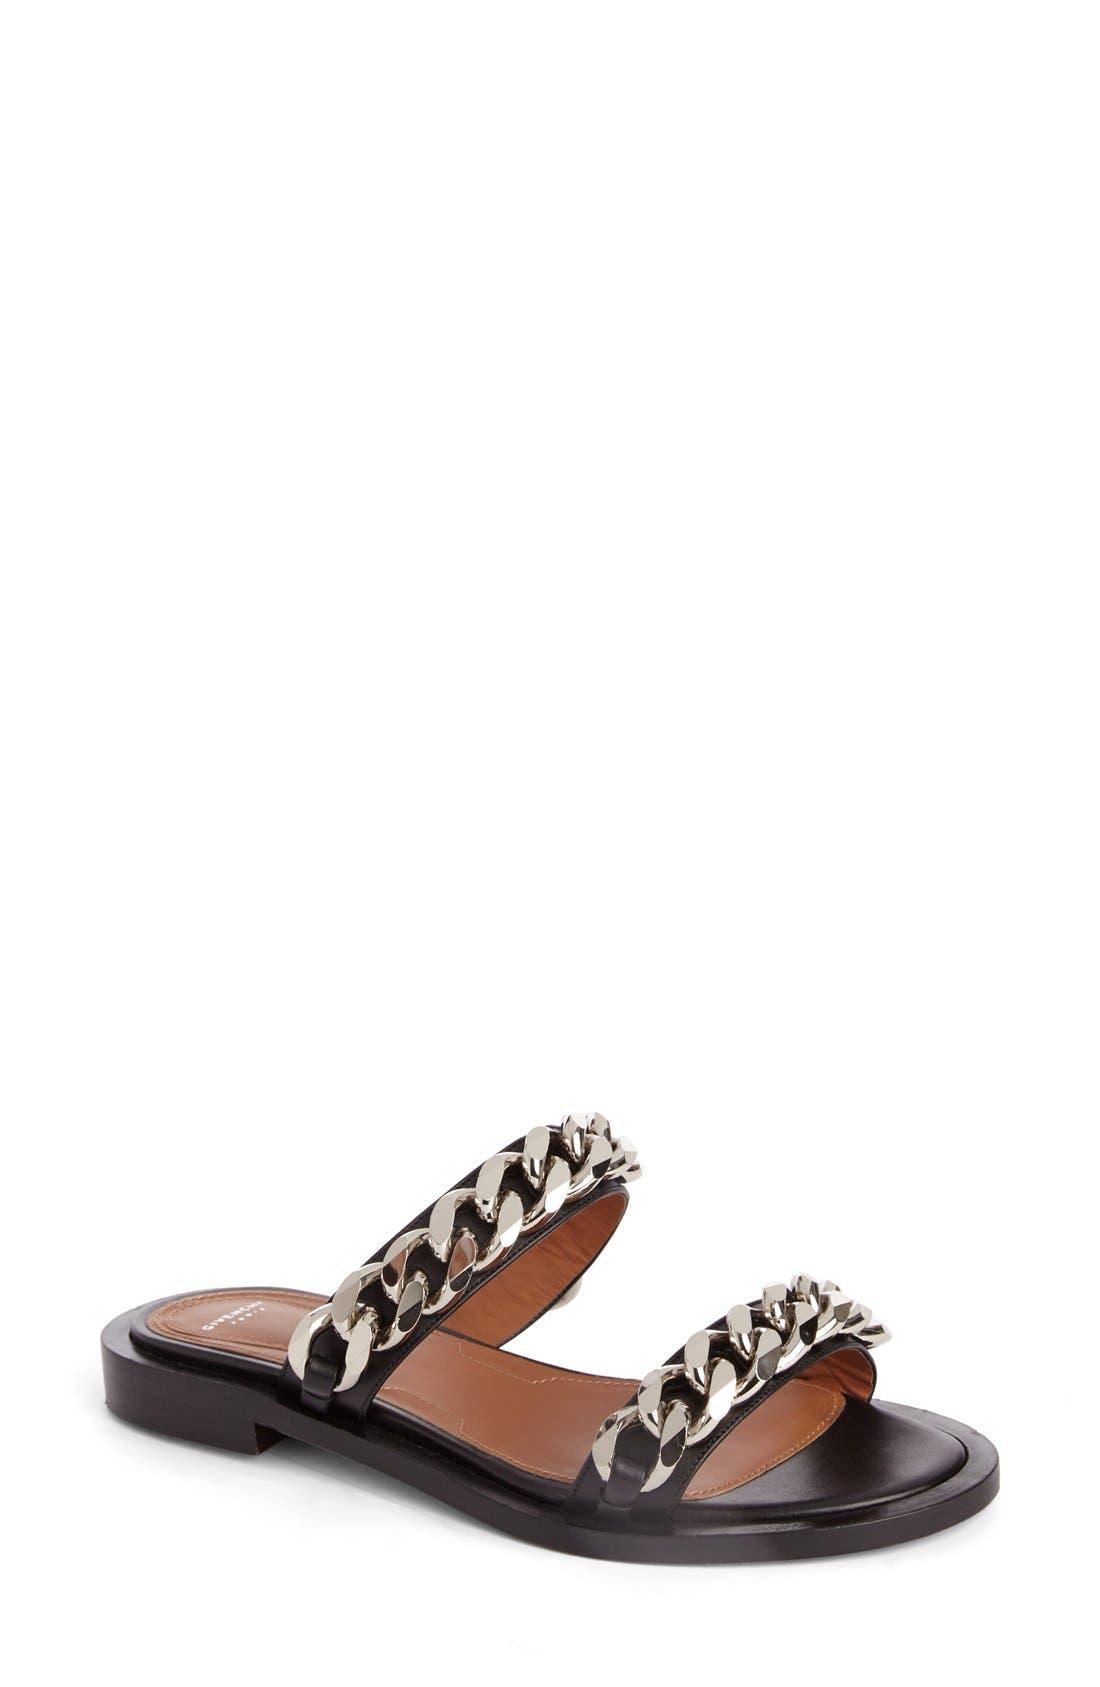 Double Chain Slide Sandal,                             Main thumbnail 1, color,                             BLACK